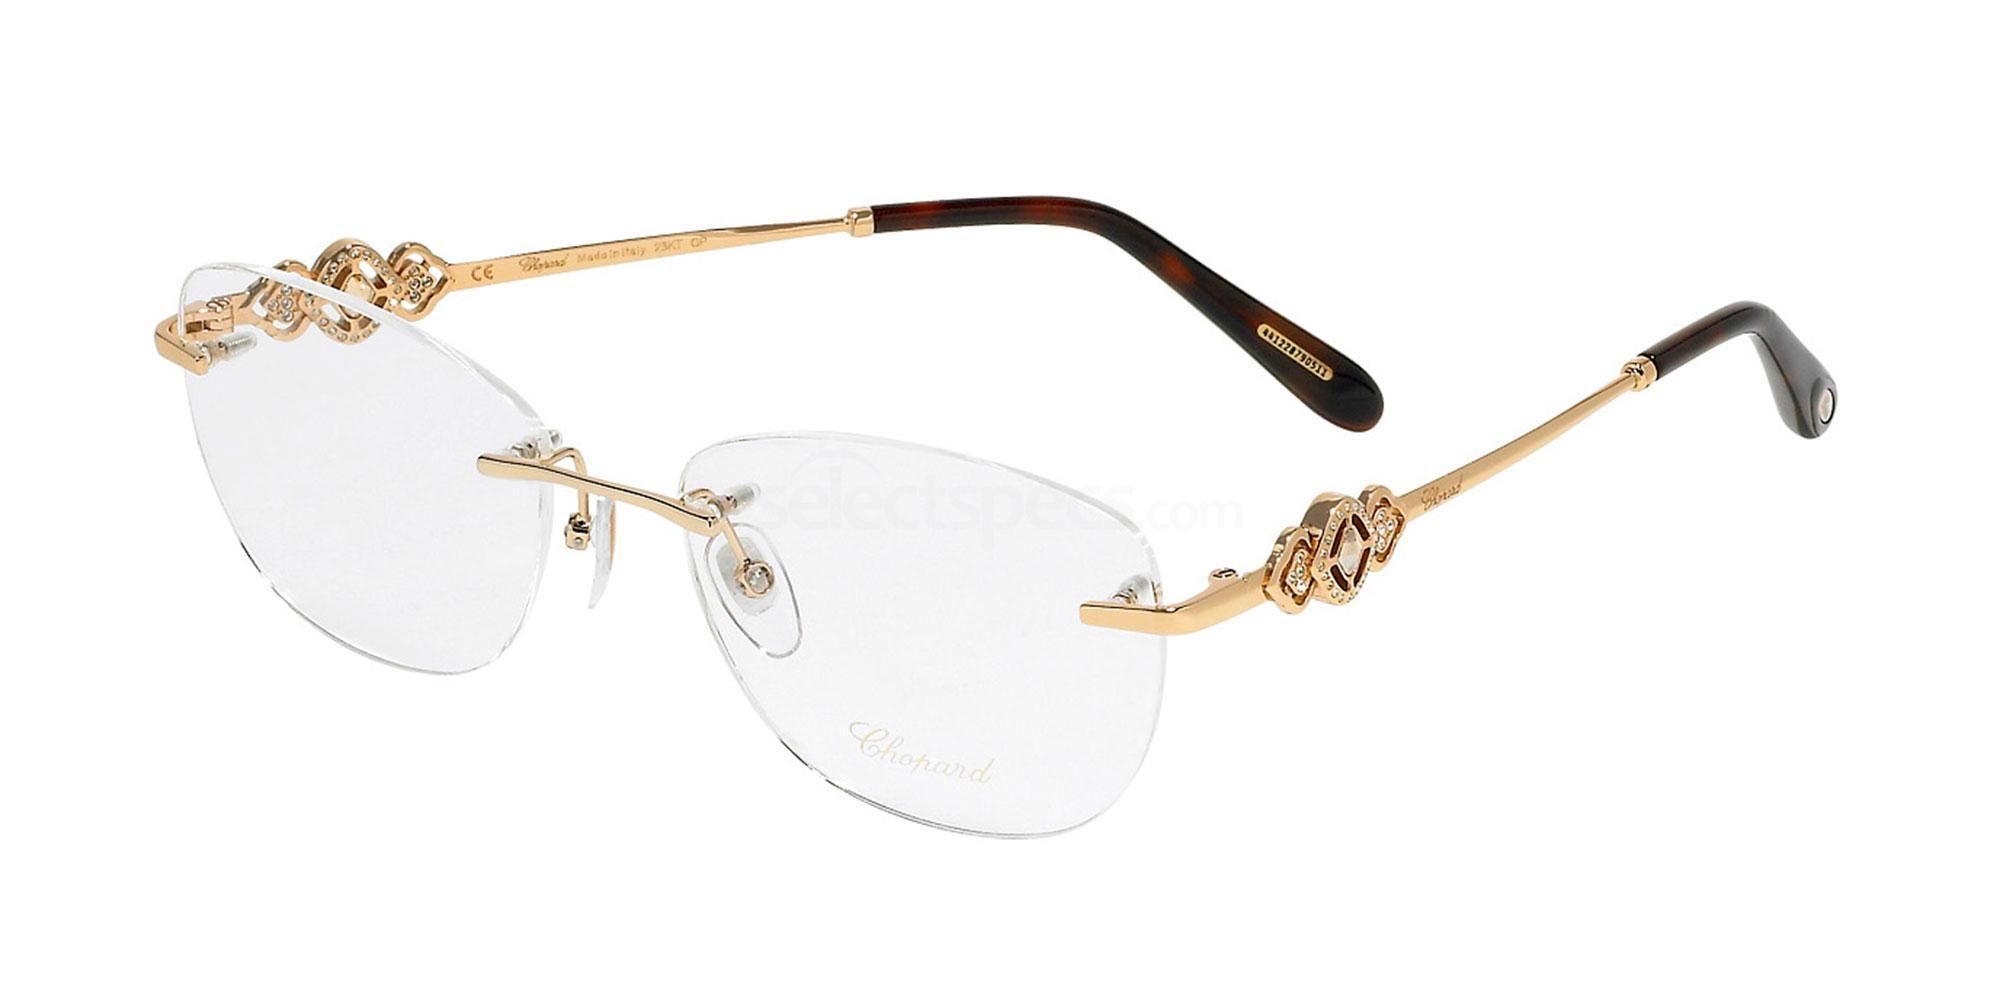 0300 VCHD11S Glasses, Chopard